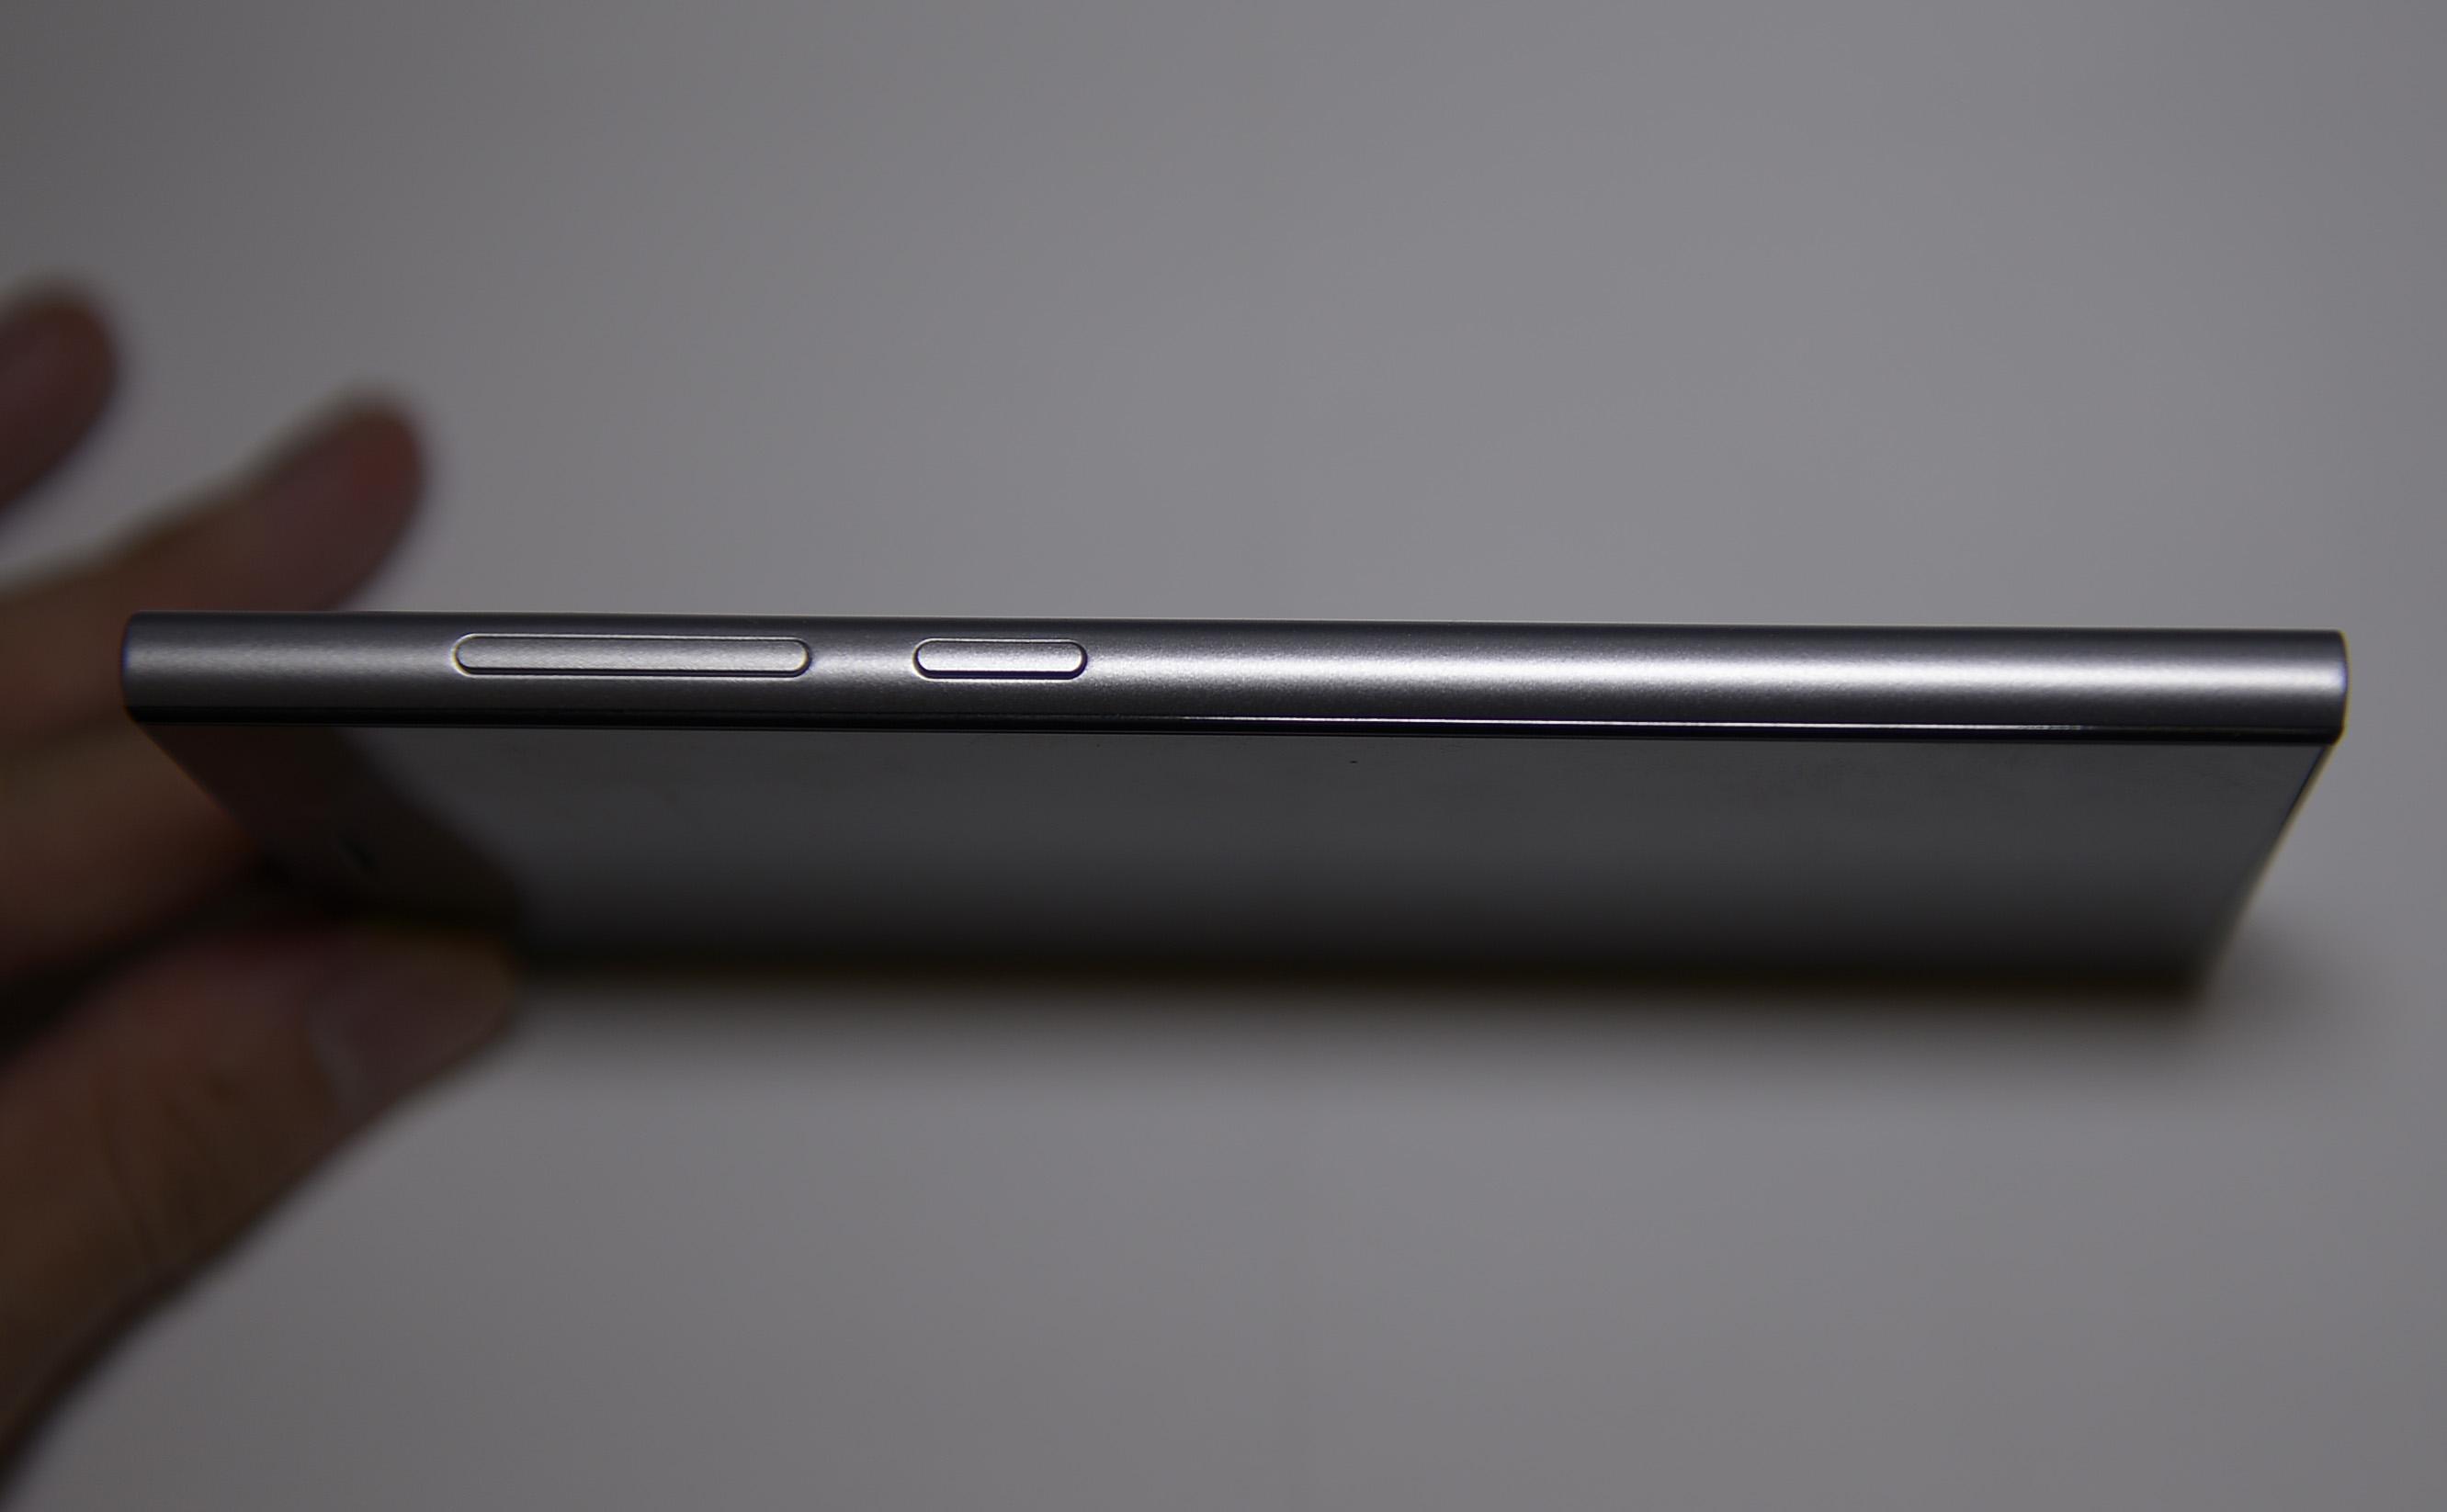 Xiaomi Mi3 Grey Xiaomi Mi3 RightXiaomi Mi3 Grey